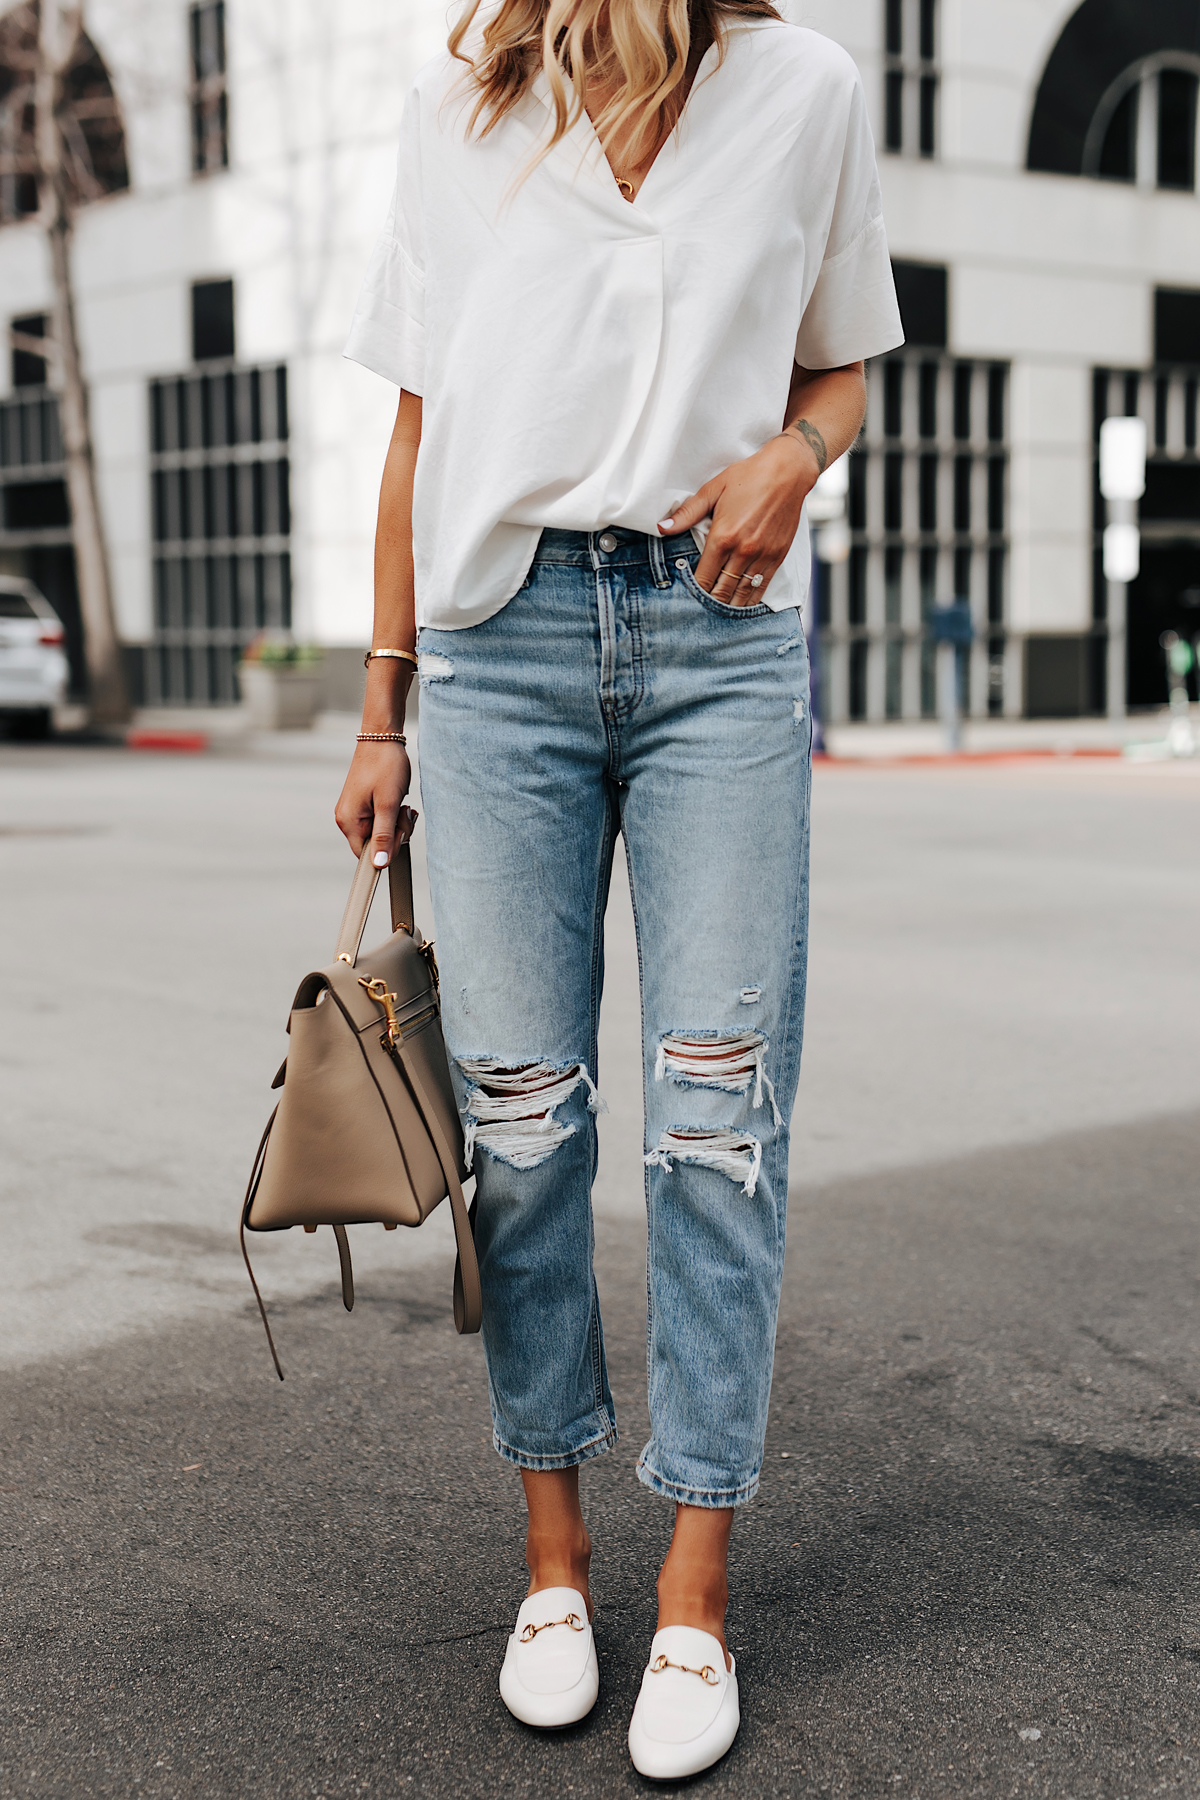 Fashion Jackson Wearing Short Sleeve White Shirt Everlane Ripped Boyfriend Jeans White Gucci Mules